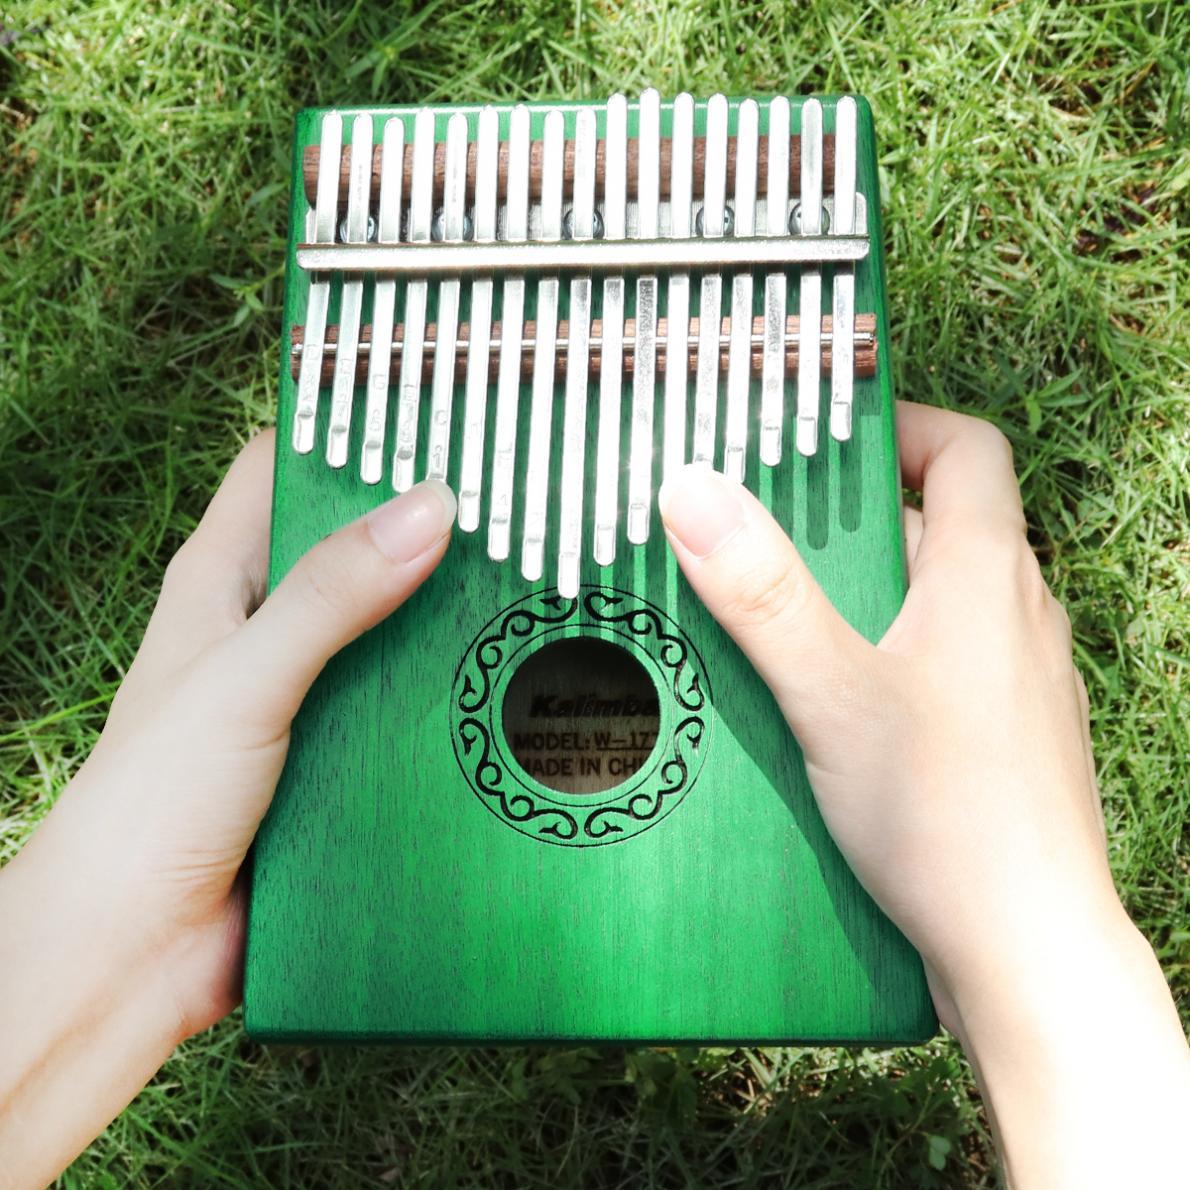 Thumb Piano 17 Key Green Kalimba Single Board Mahogany  Mbira Mini Keyboard Instrument with Complete Accessories enlarge